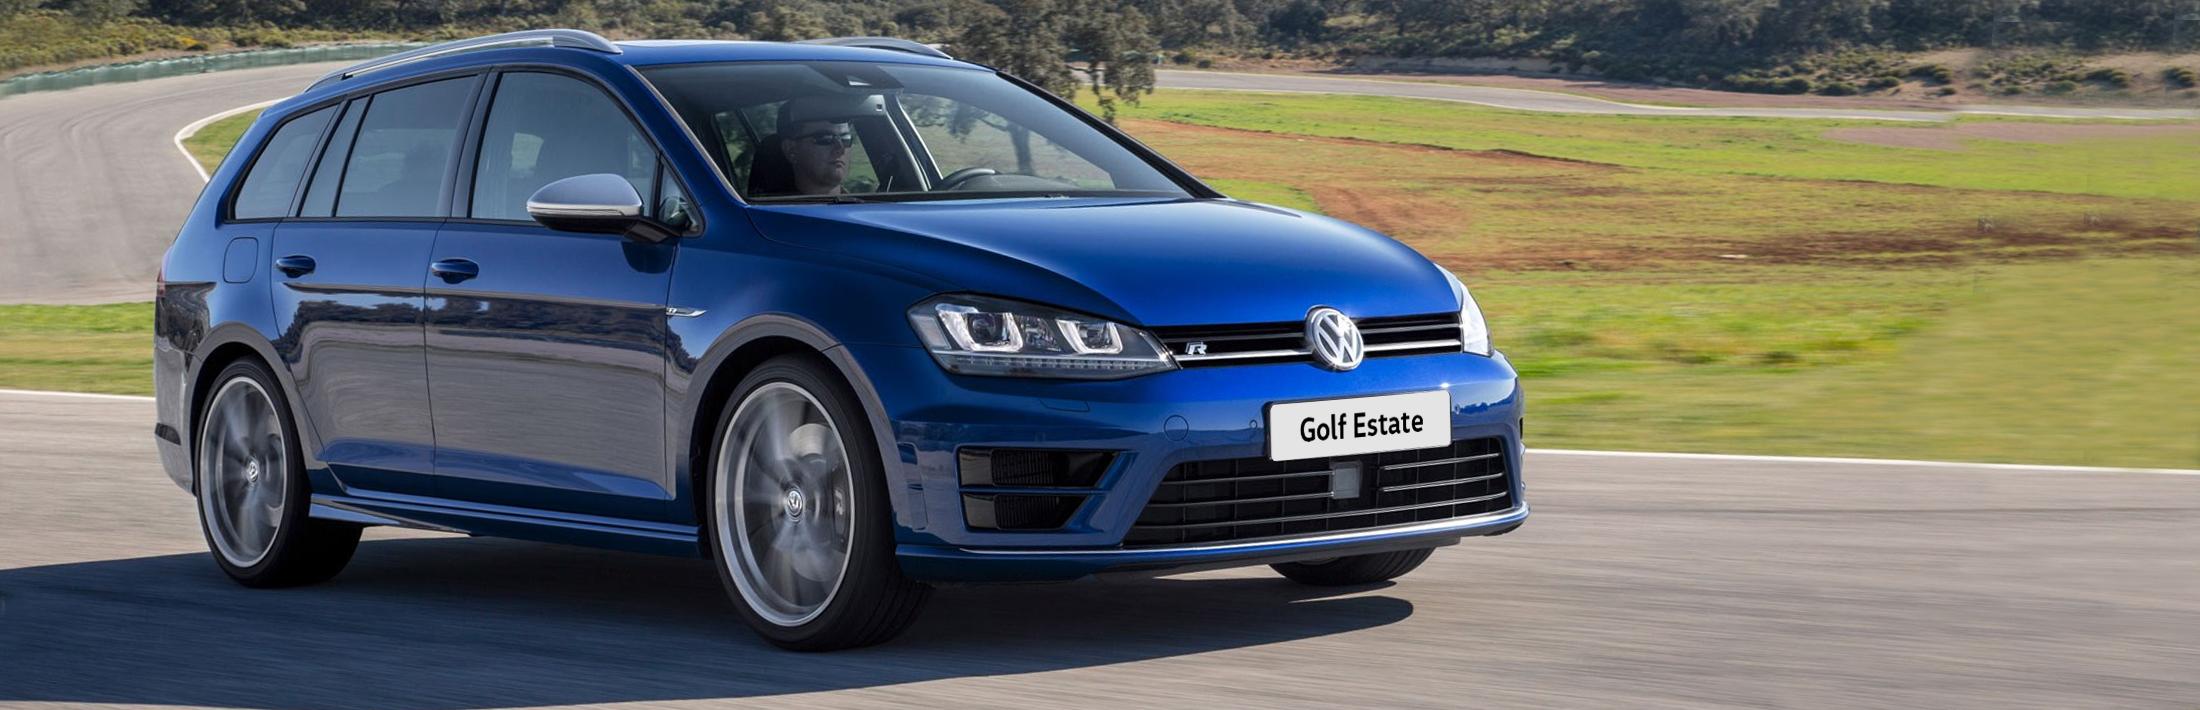 Golf Estate Slider 2